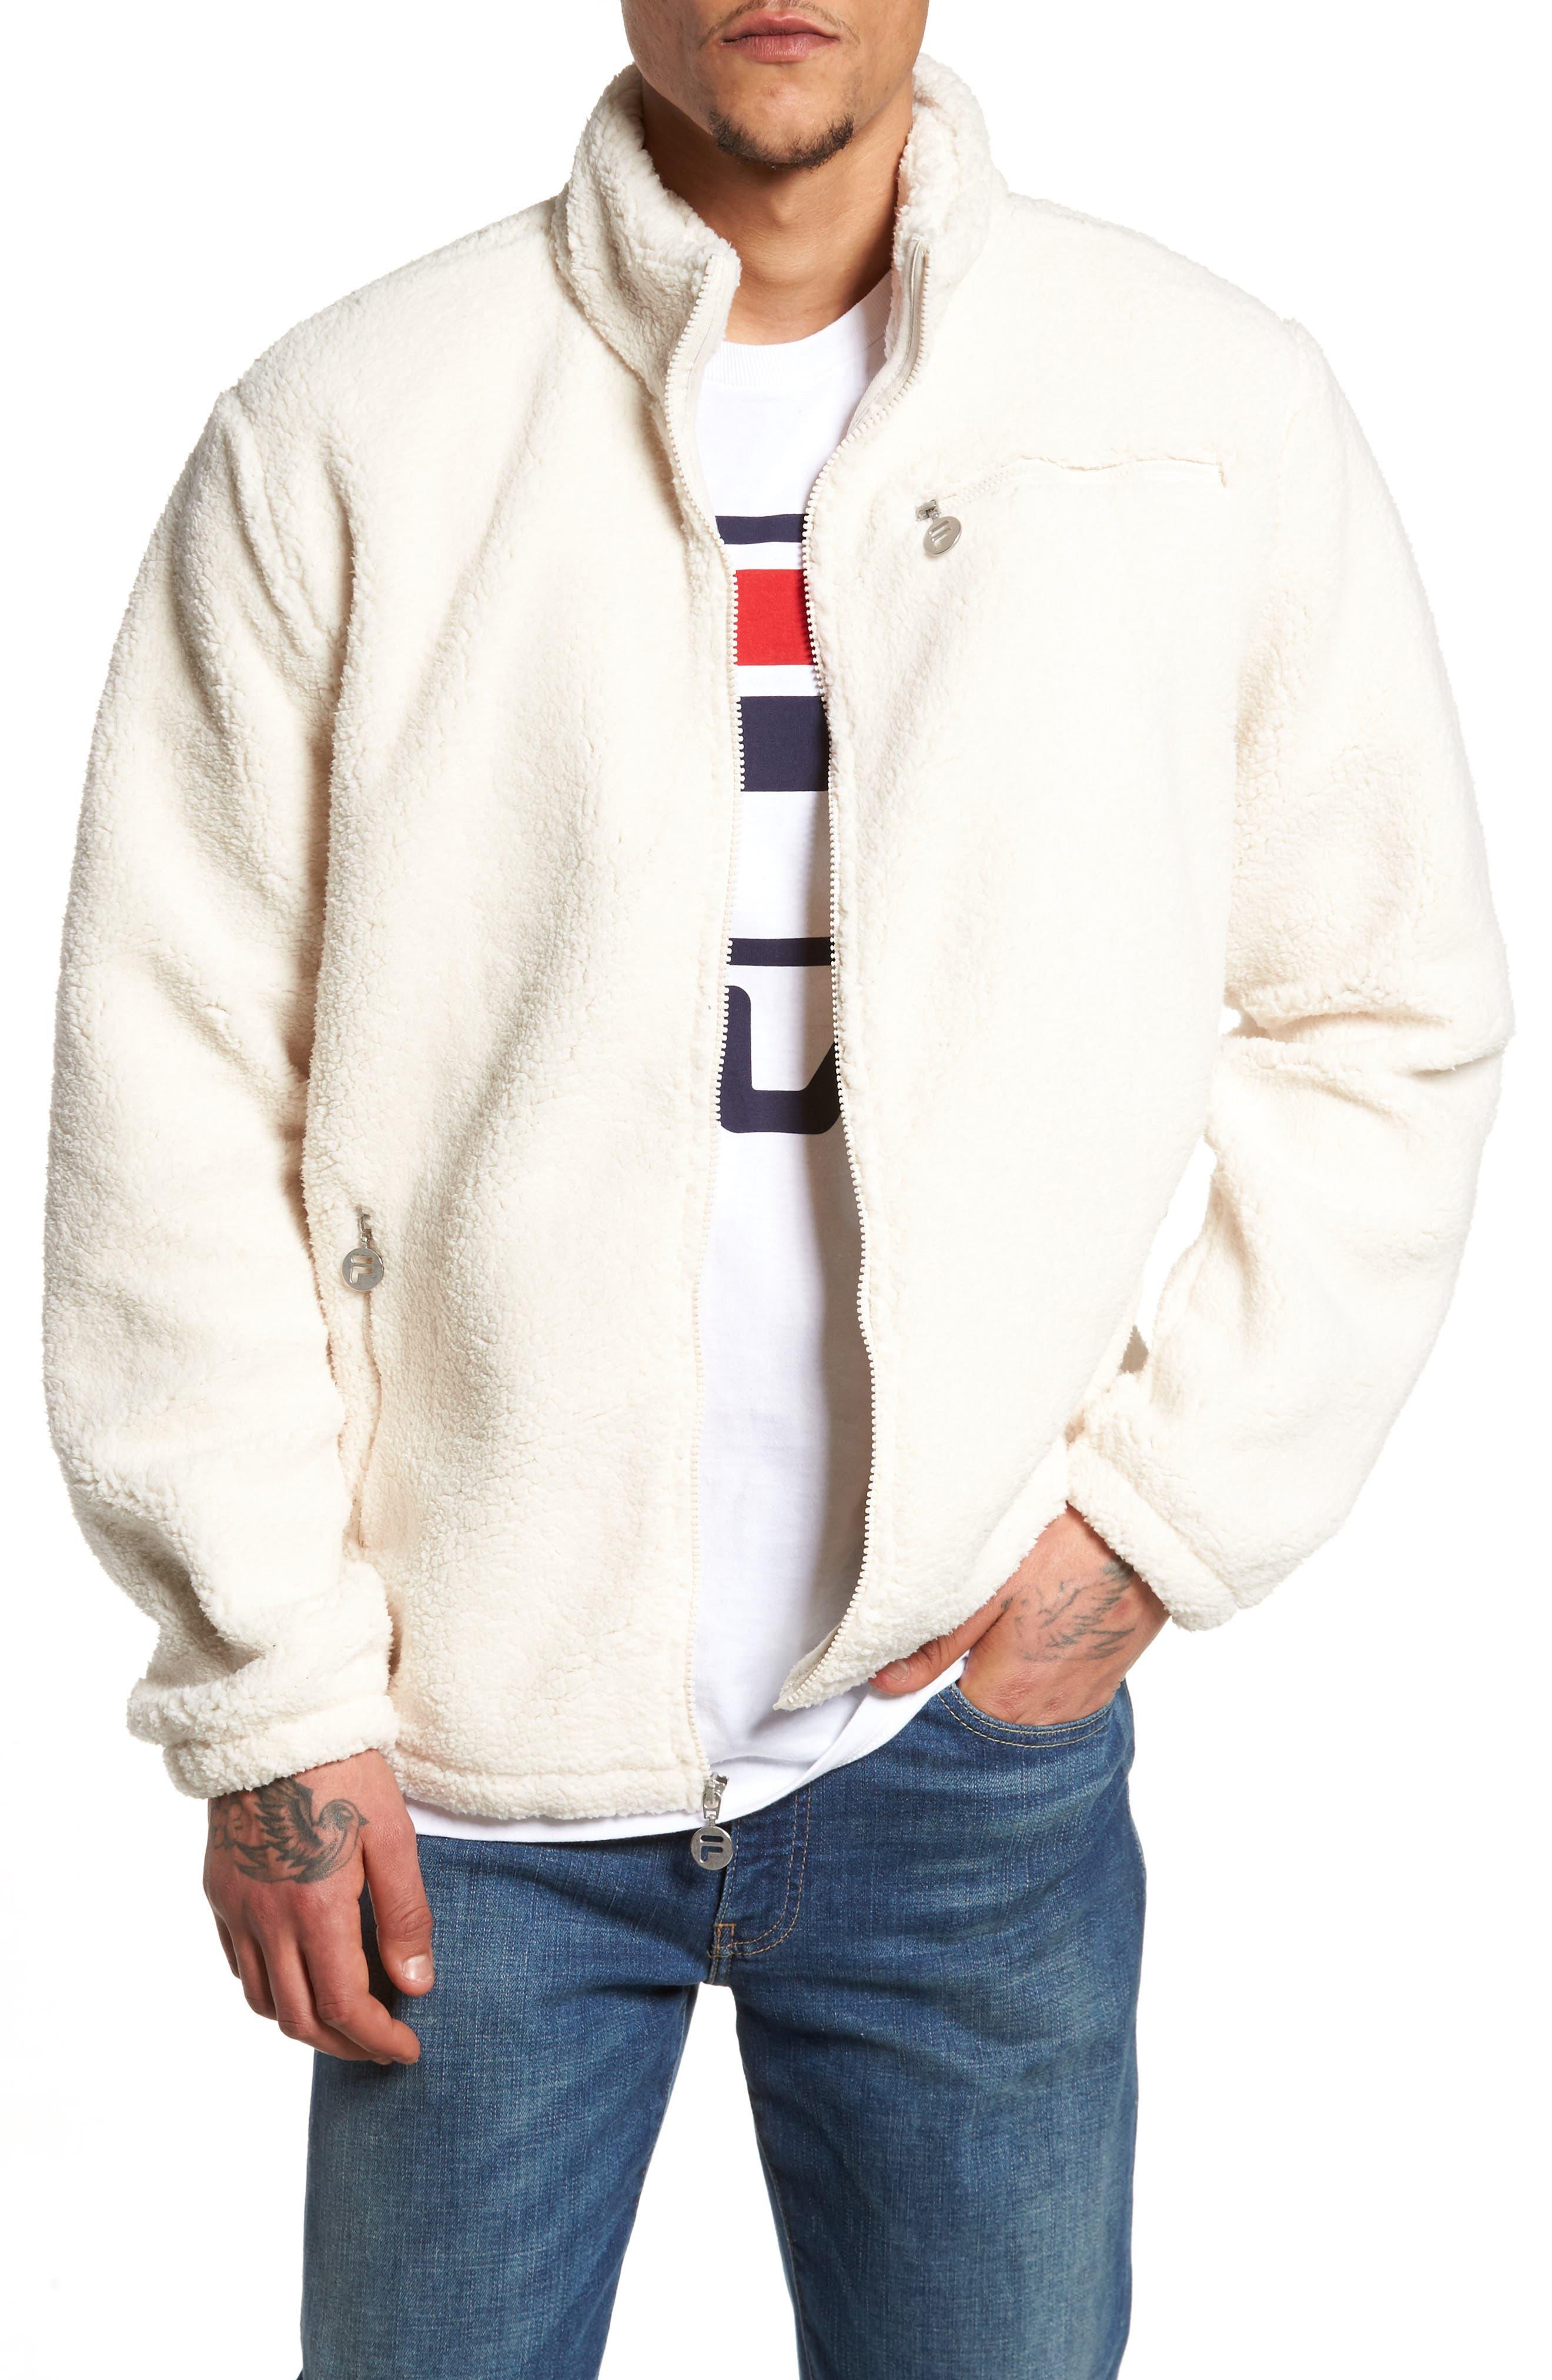 Finlay Fleece Jacket,                         Main,                         color, Gardenia/ Navy/ Chinese Red